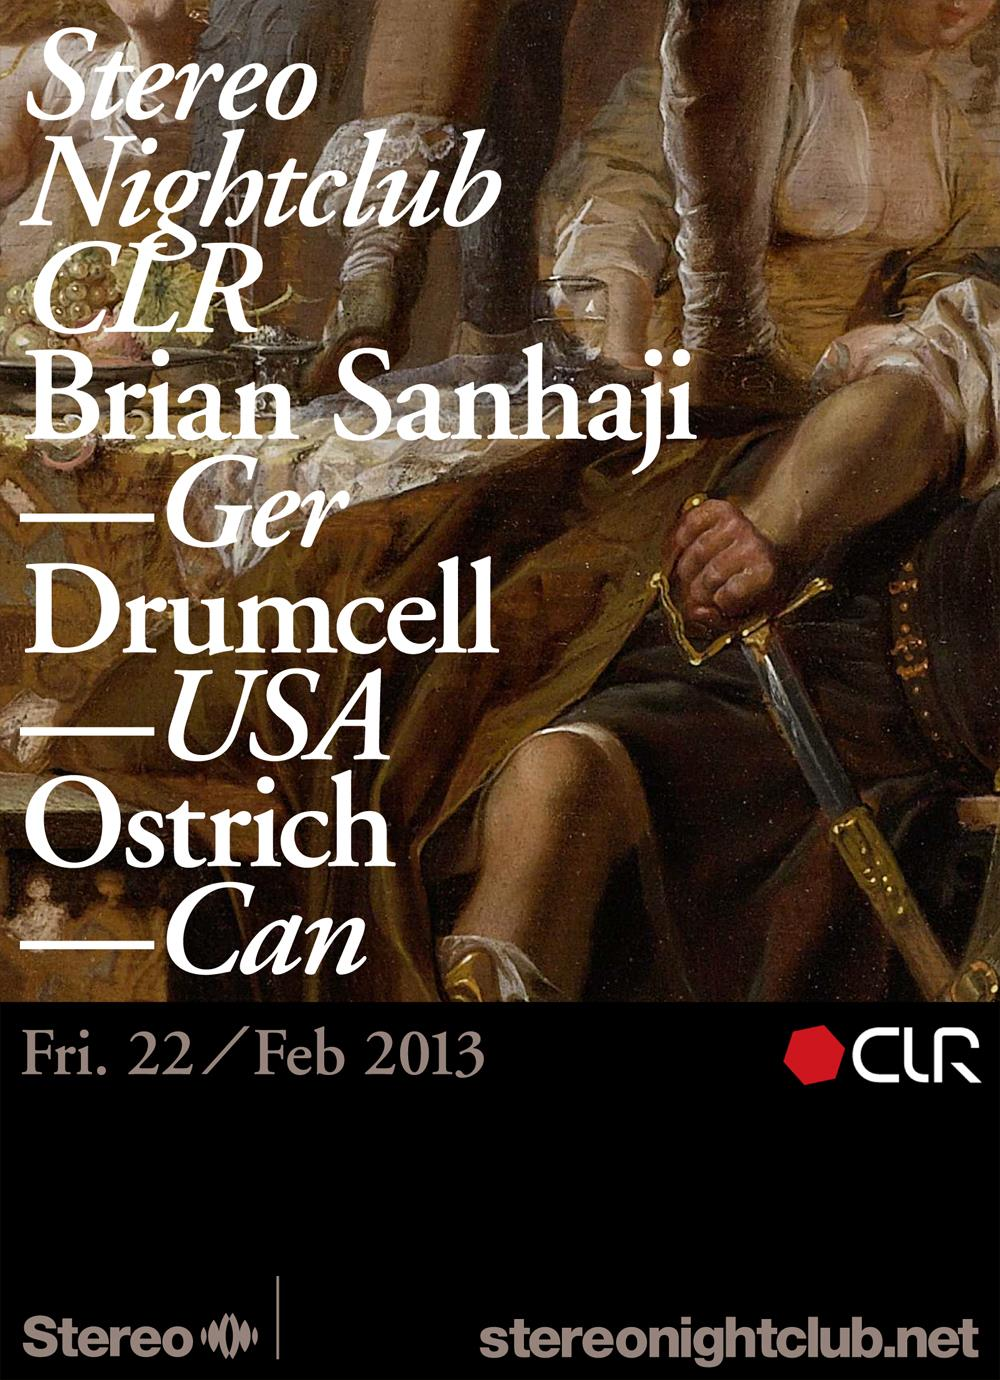 B  rian Sanhaji, Drumcell, Ostrich Stereo Montreal